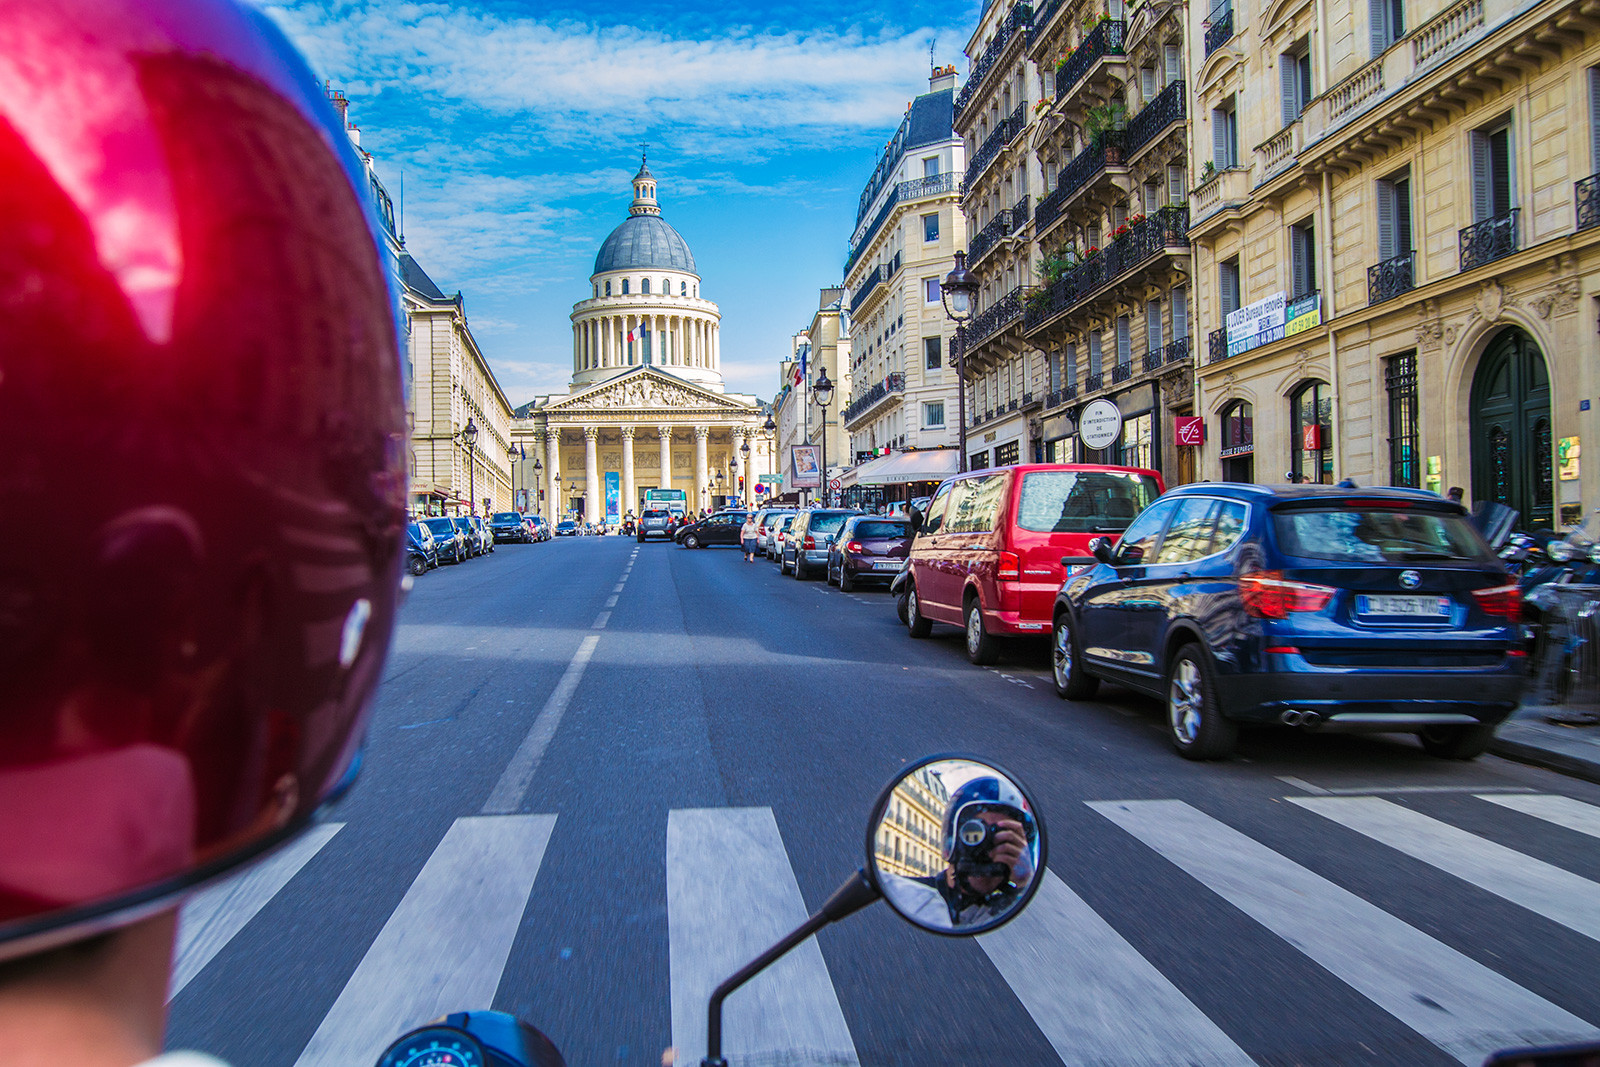 Un tour retro: Recorriendo París en moto con Sidecar